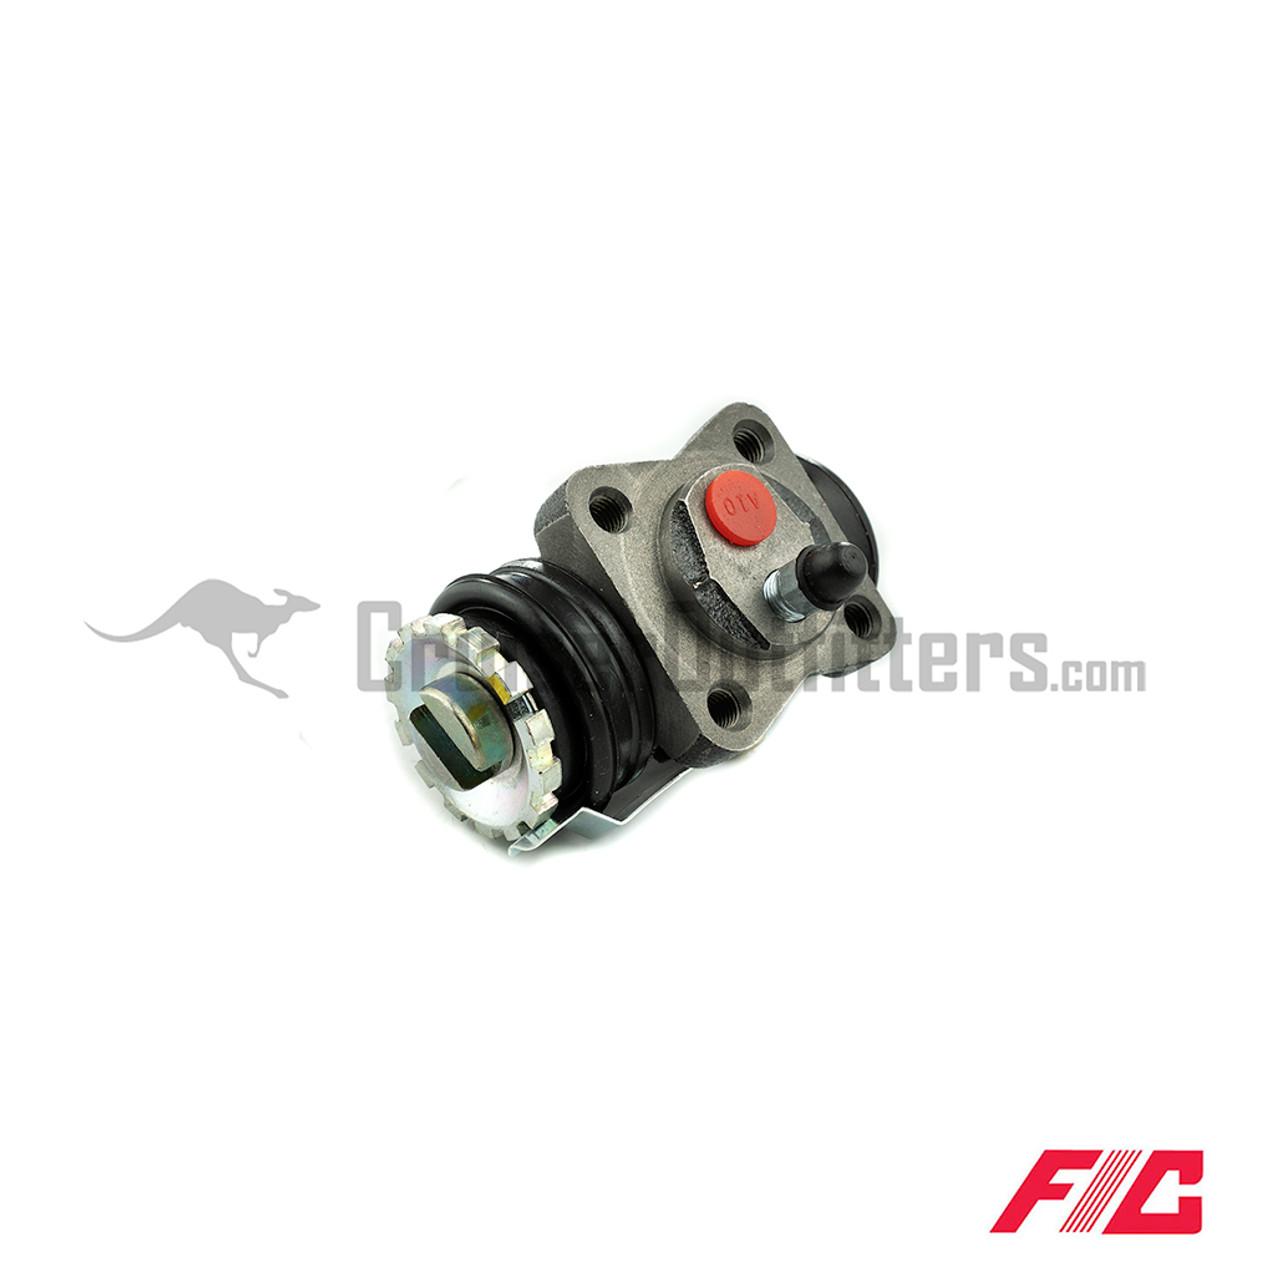 BWCR69075RU - Wheel Cylinder - Rear Top (Front)